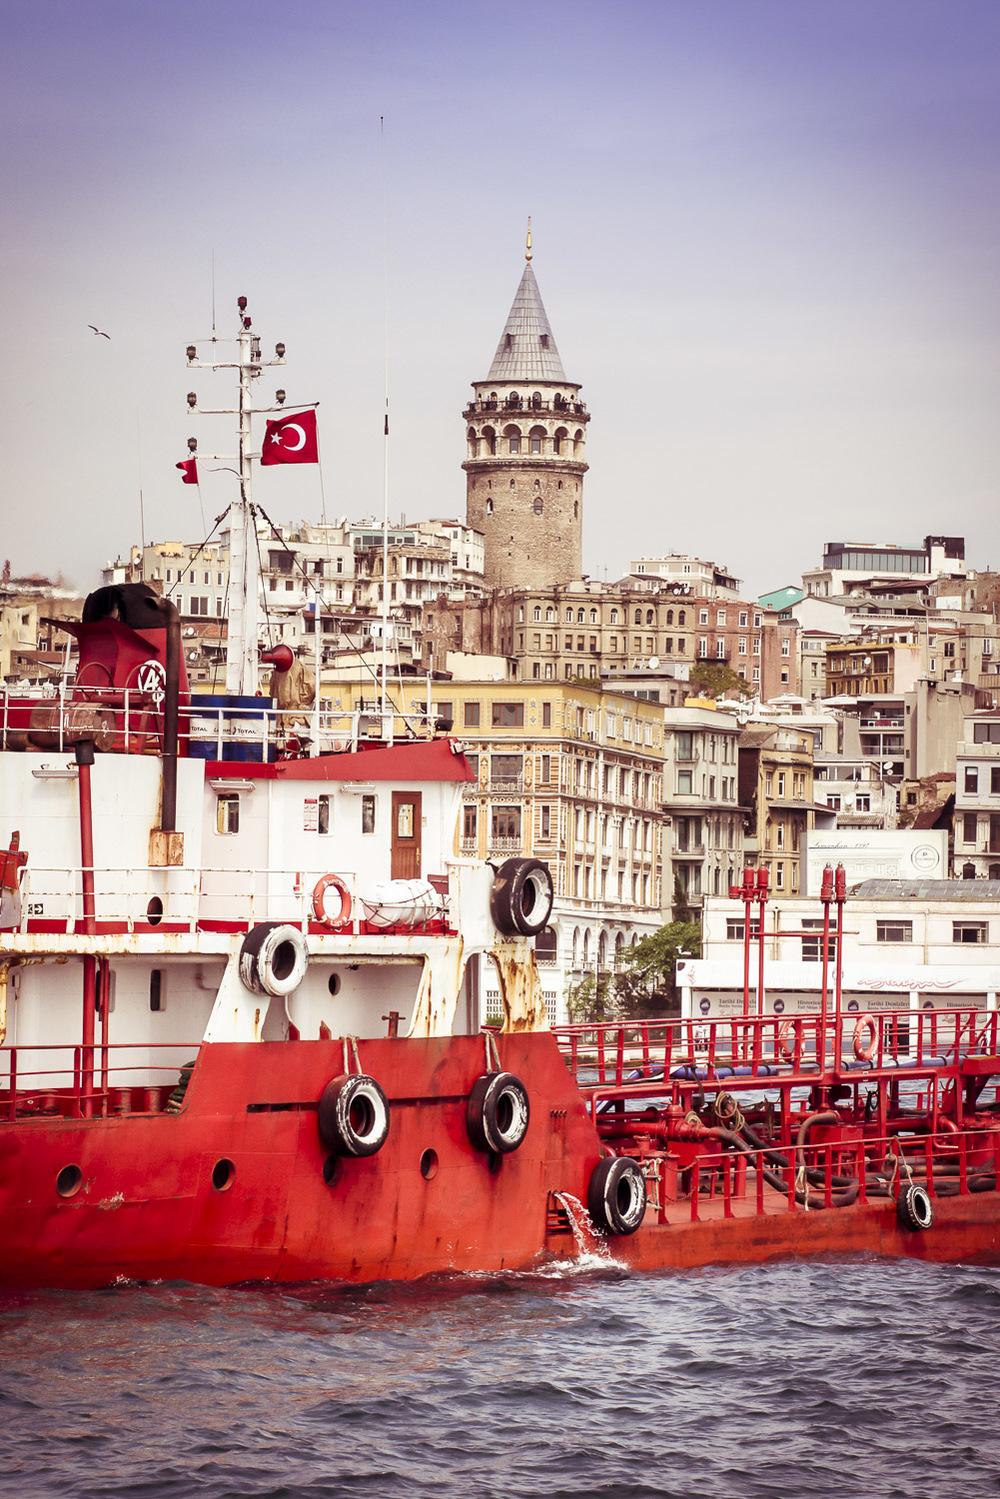 13-universitas-istanbul-(c)-nicolas-brodard-ref130514103735.jpg